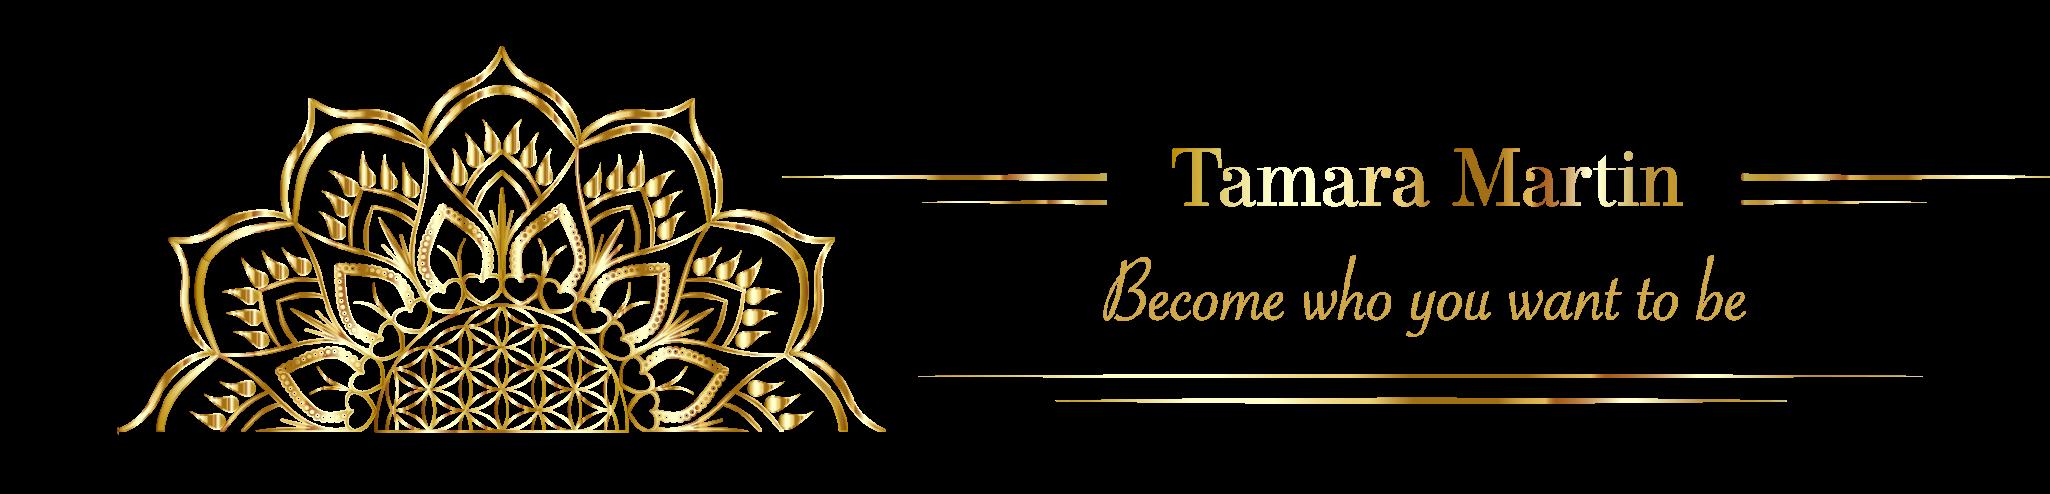 Logo-Tamara-Martin-BodyMind-Coach-Onlinekurs-Motivation